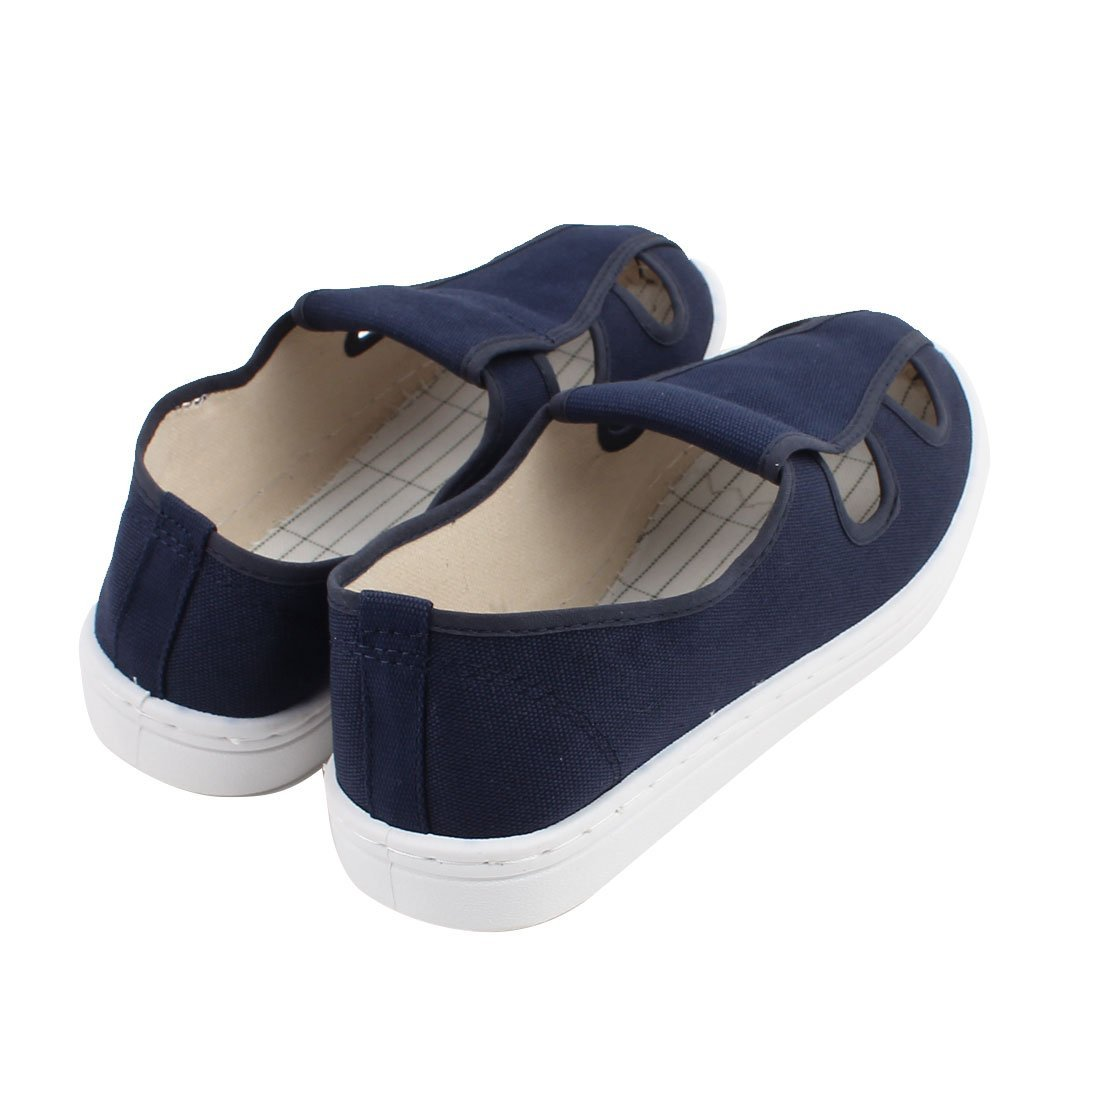 Amazon.com: eDealMax US7 UK6.5 EU39 PU antideslizante Suela Plana Anti-estática Zapatos de lona blancos 4hole: Electronics